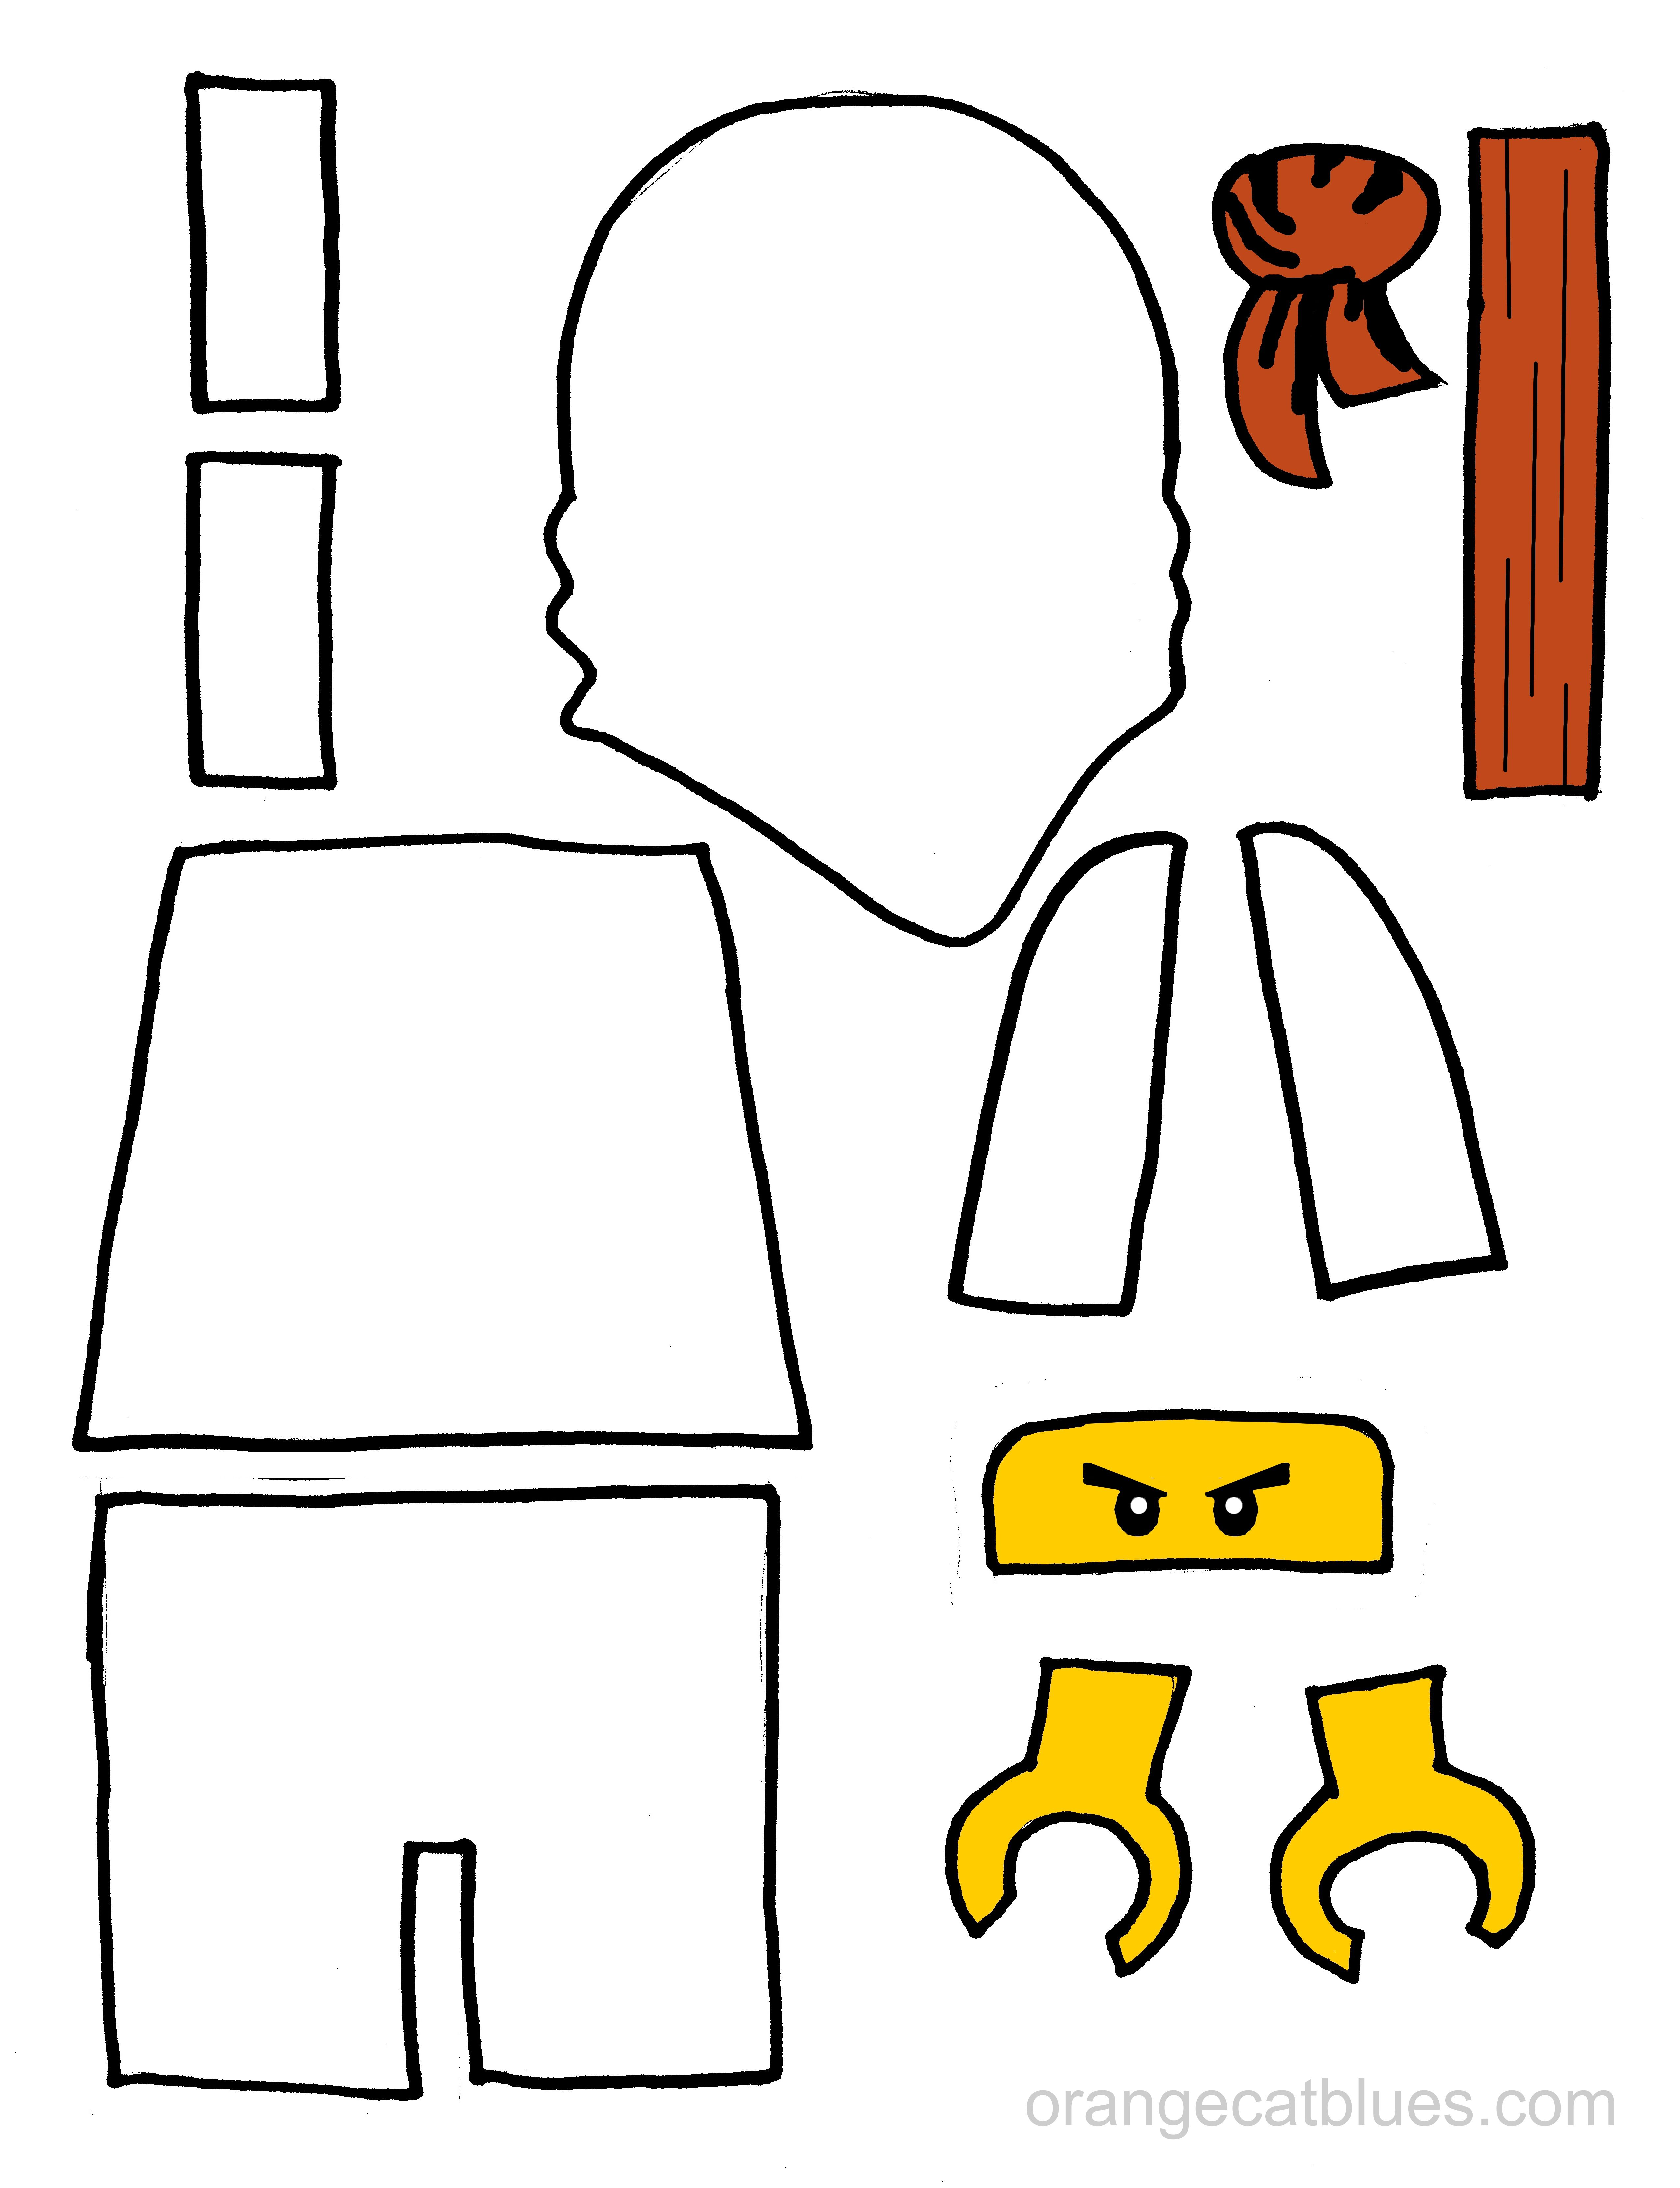 Lego Ninjago Printable Cutout For Toddler Gluestick Art The White Ninja Zane